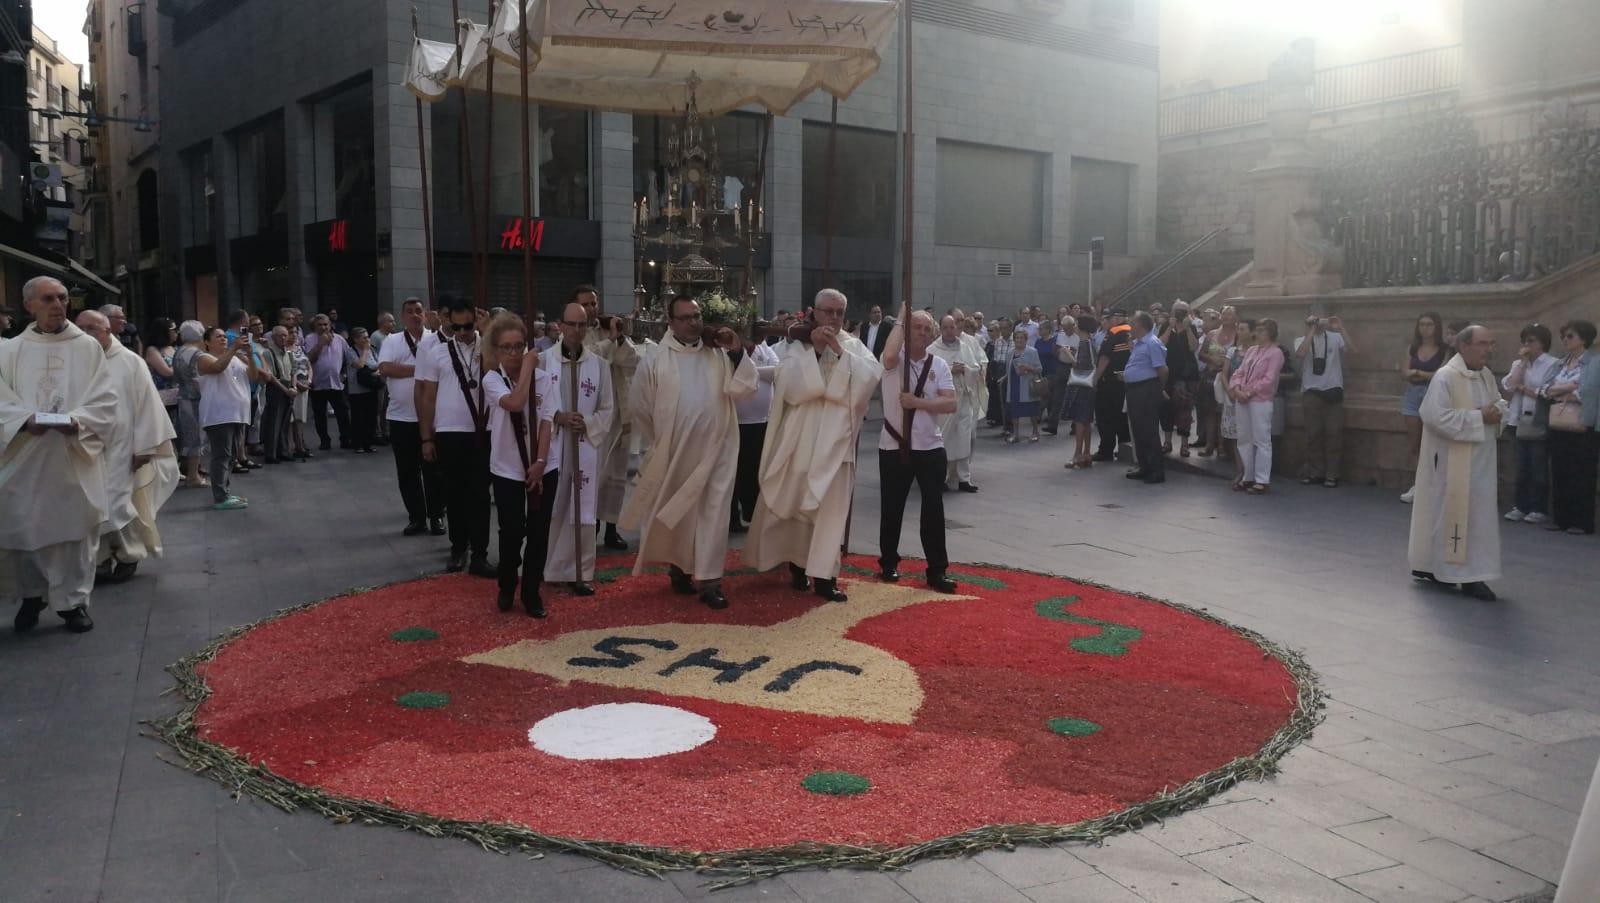 Processó litúrgica, diumenge 23 juny